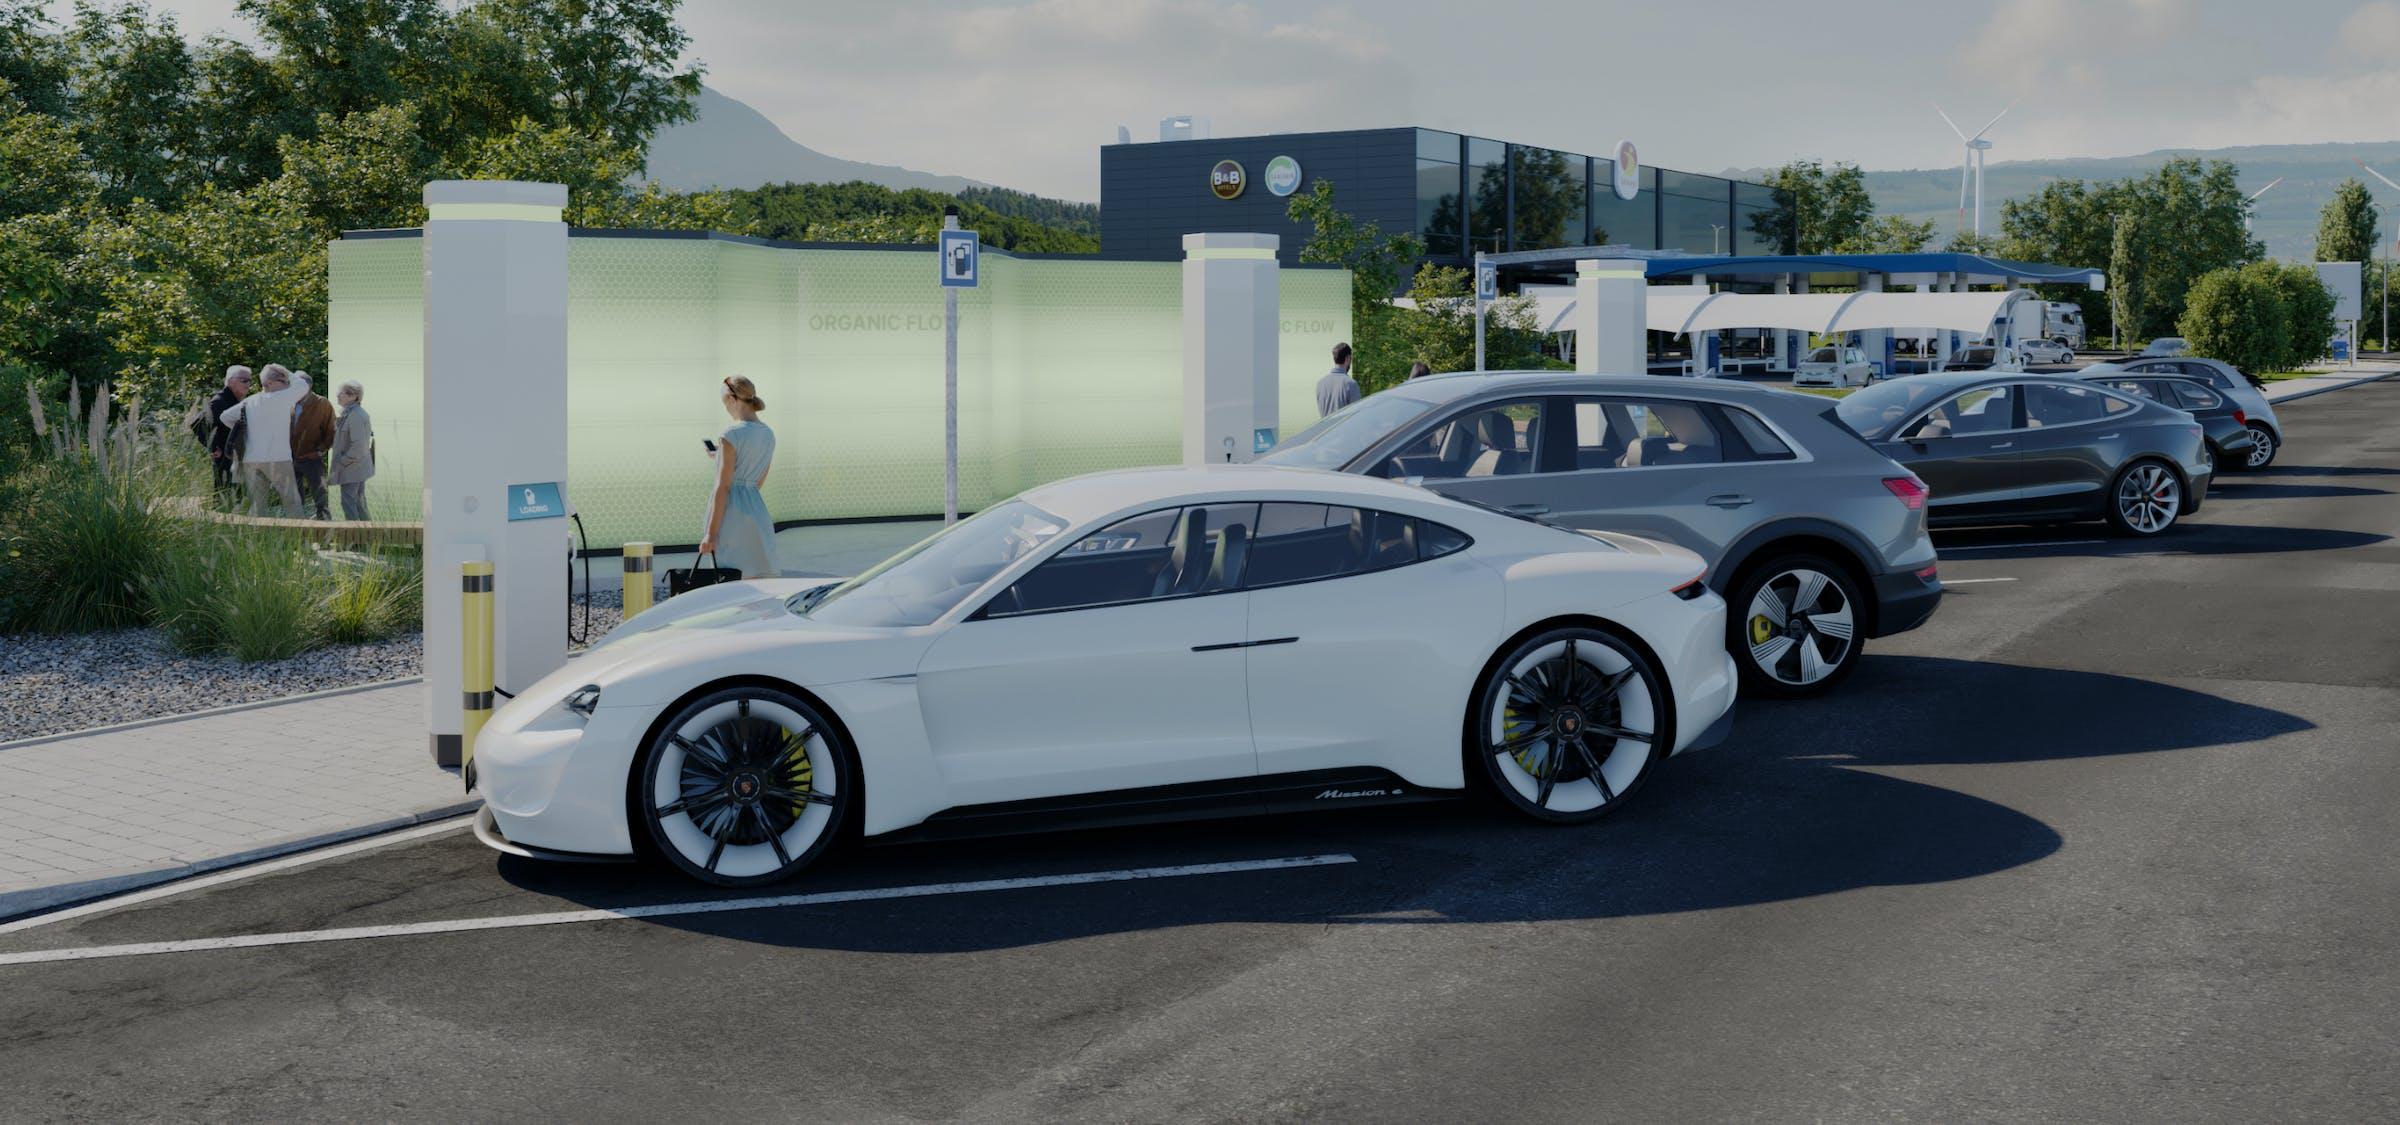 Organic flow batteriesto optimize electric vehicle charging.